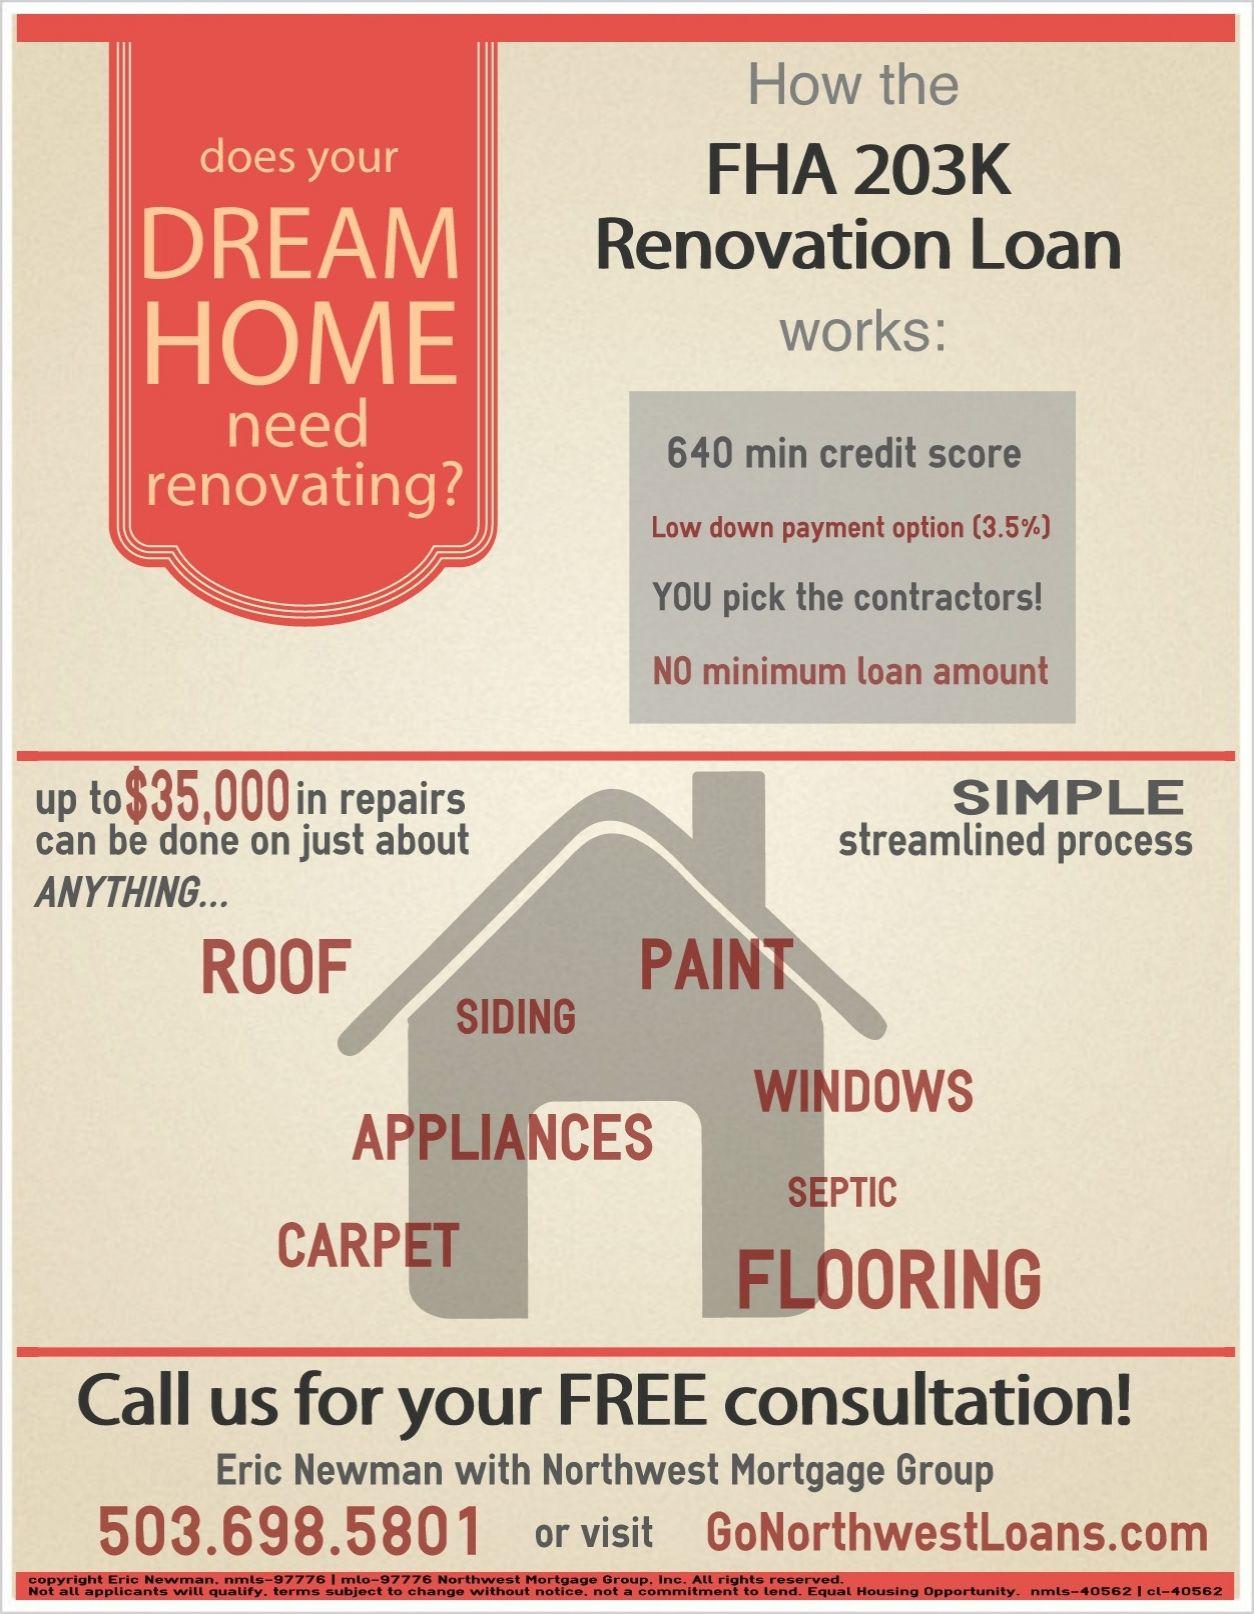 What S An Fha 203k Renovation Loan Renovation Loans Fha Loan